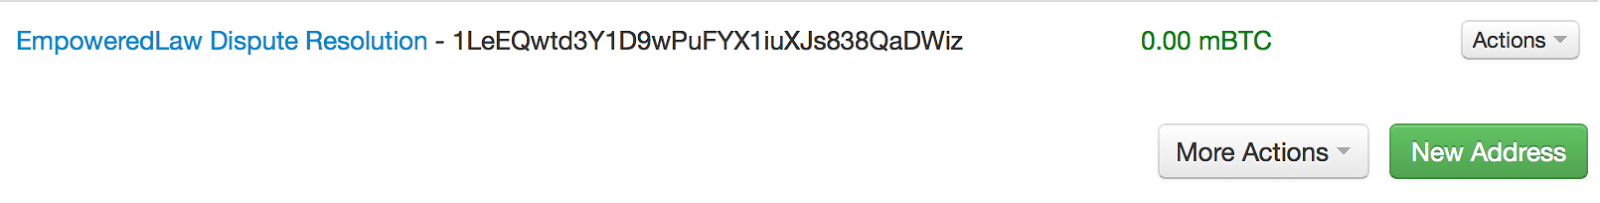 Screenshot 2014-03-27 08.29.06.png